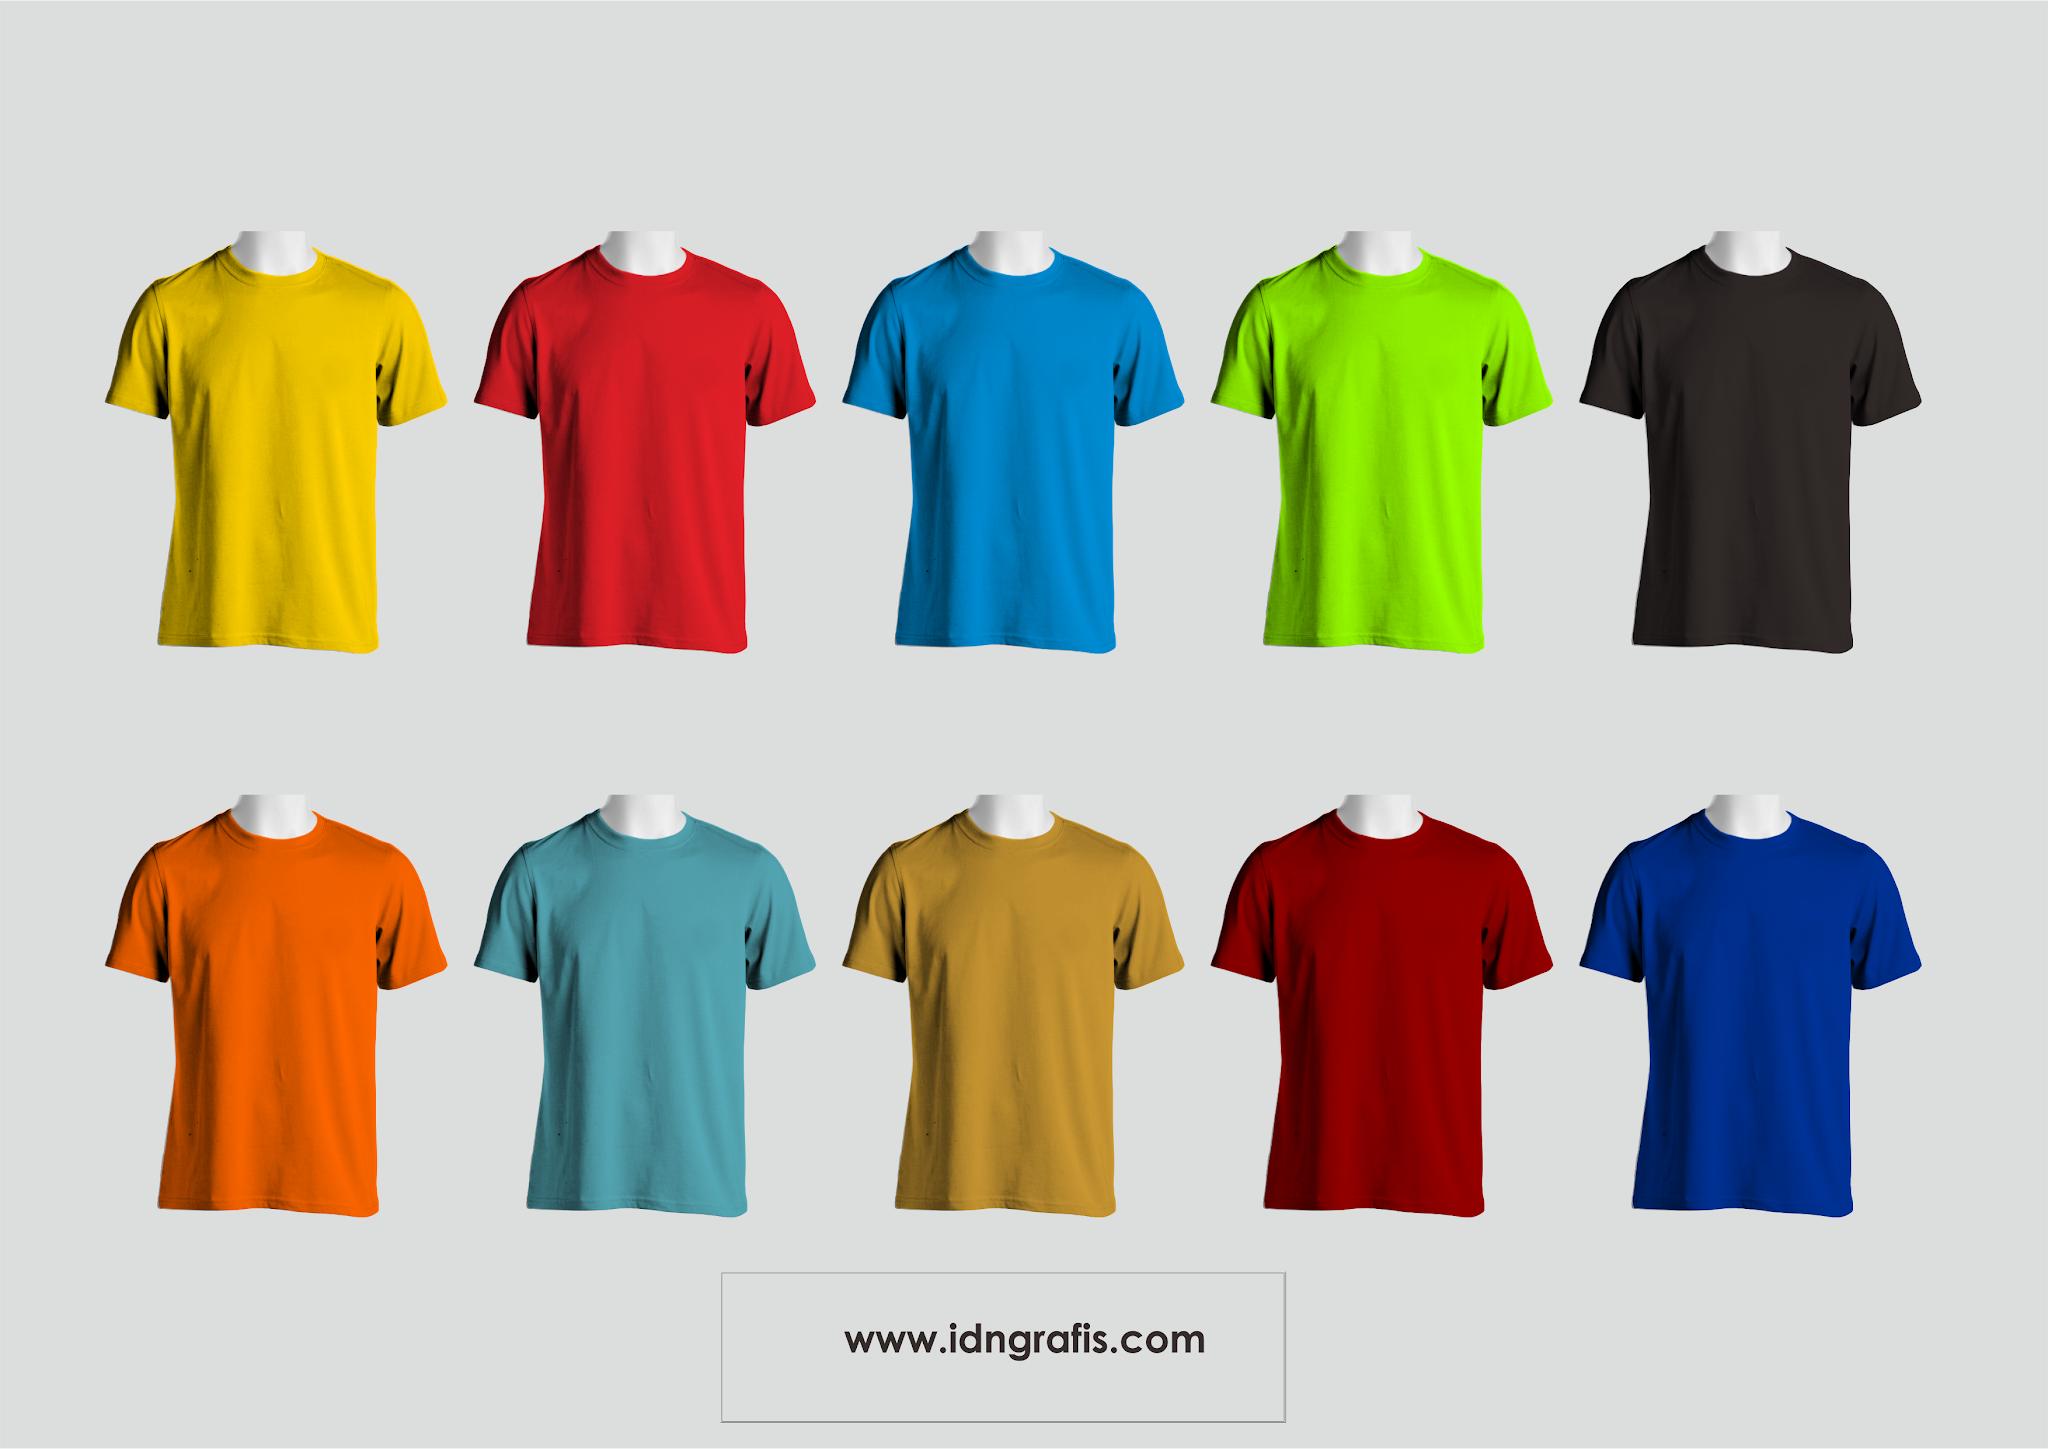 1551 best t shirt mockup vector ✓ free vector download for commercial use in ai, eps, cdr, svg vector illustration graphic art design format. Mockup Kaos Corel Draw Bisa Ganti Warna Idn Grafis